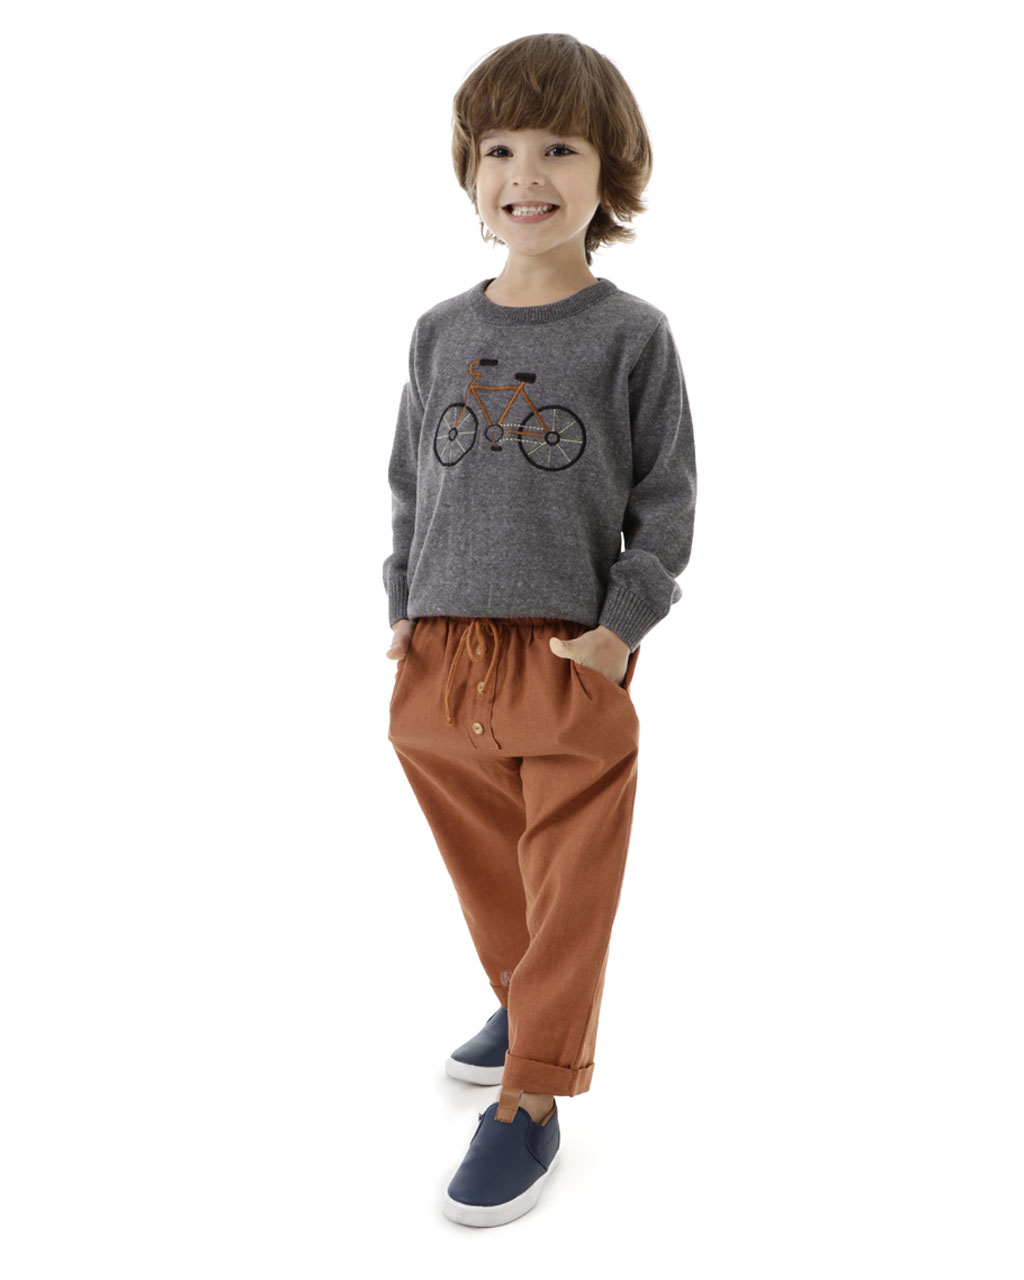 Calça Infantil Masculina Linho Cós de Elástico Mini Lord